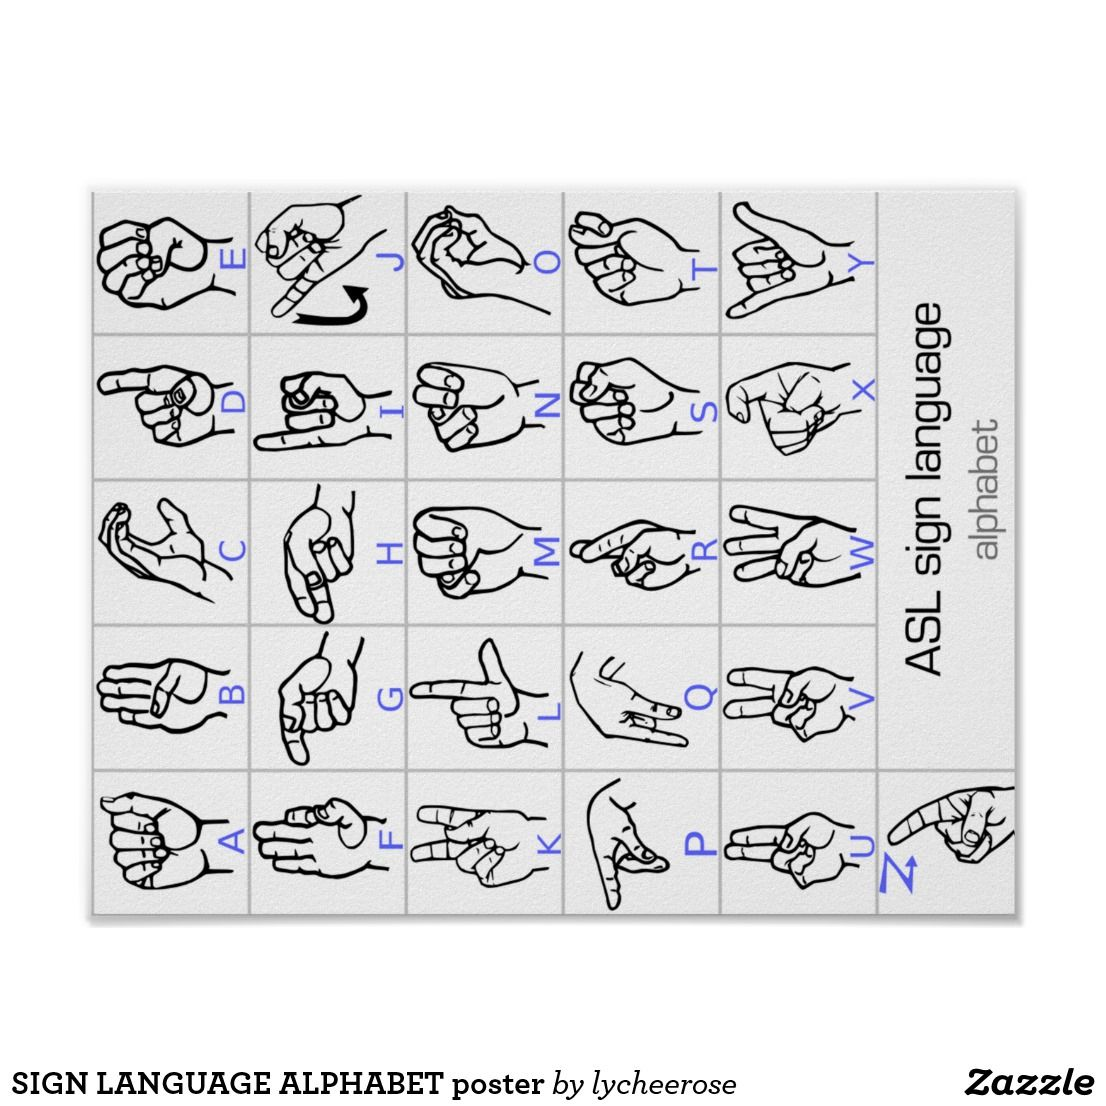 Sign Language Alphabet Poster